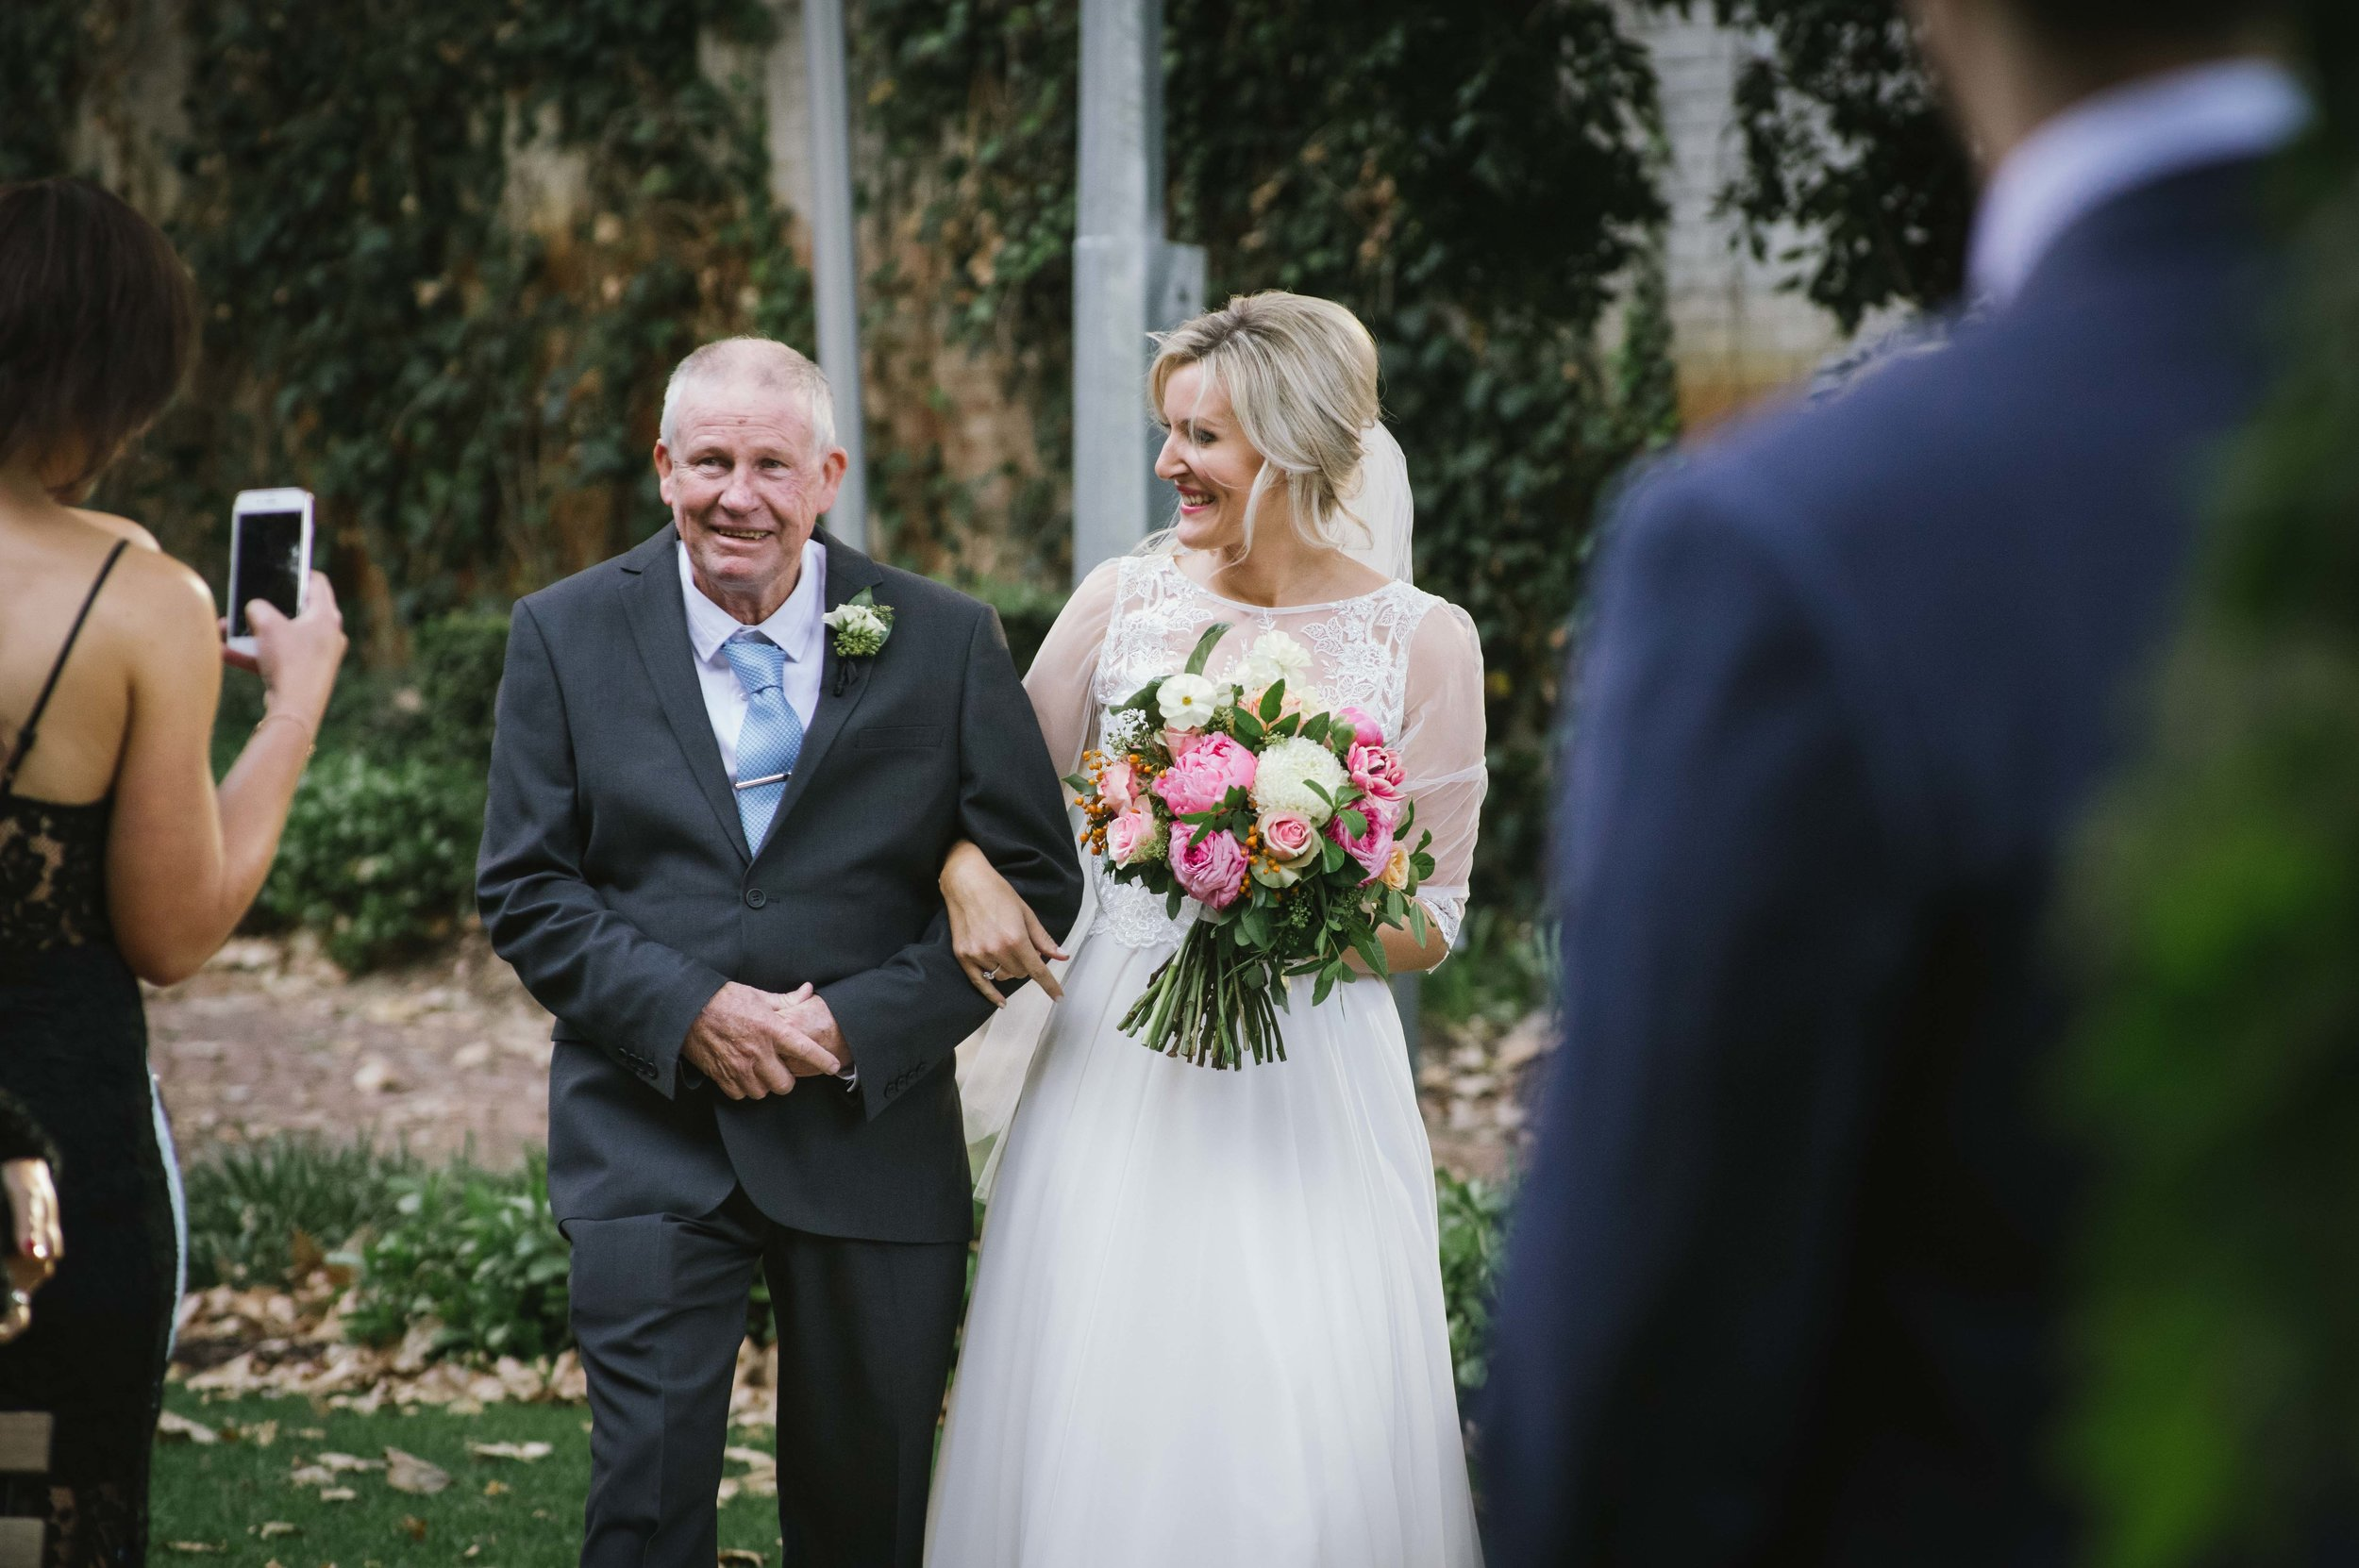 Lamonts Bishops House City Urban Perth Wheatbelt Avon Valley Wedding Photographer Photography (11).jpg